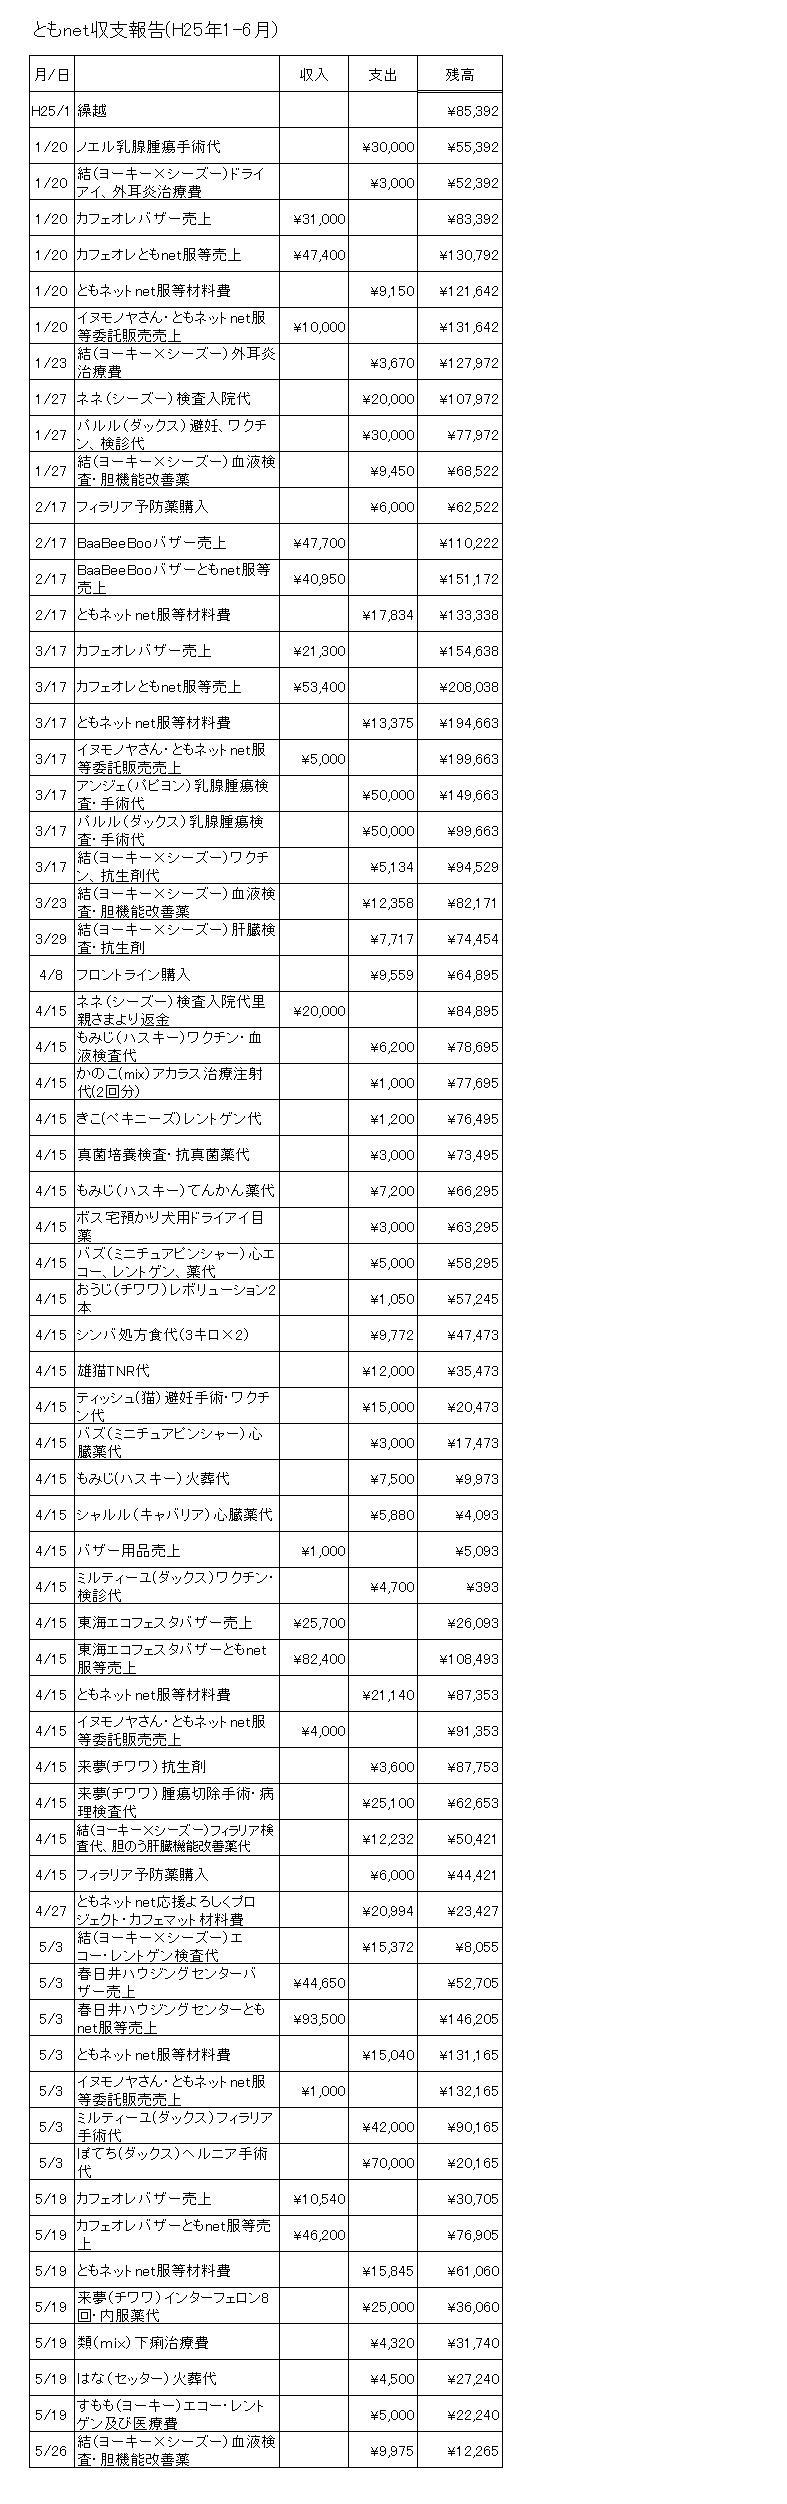 収支報告1